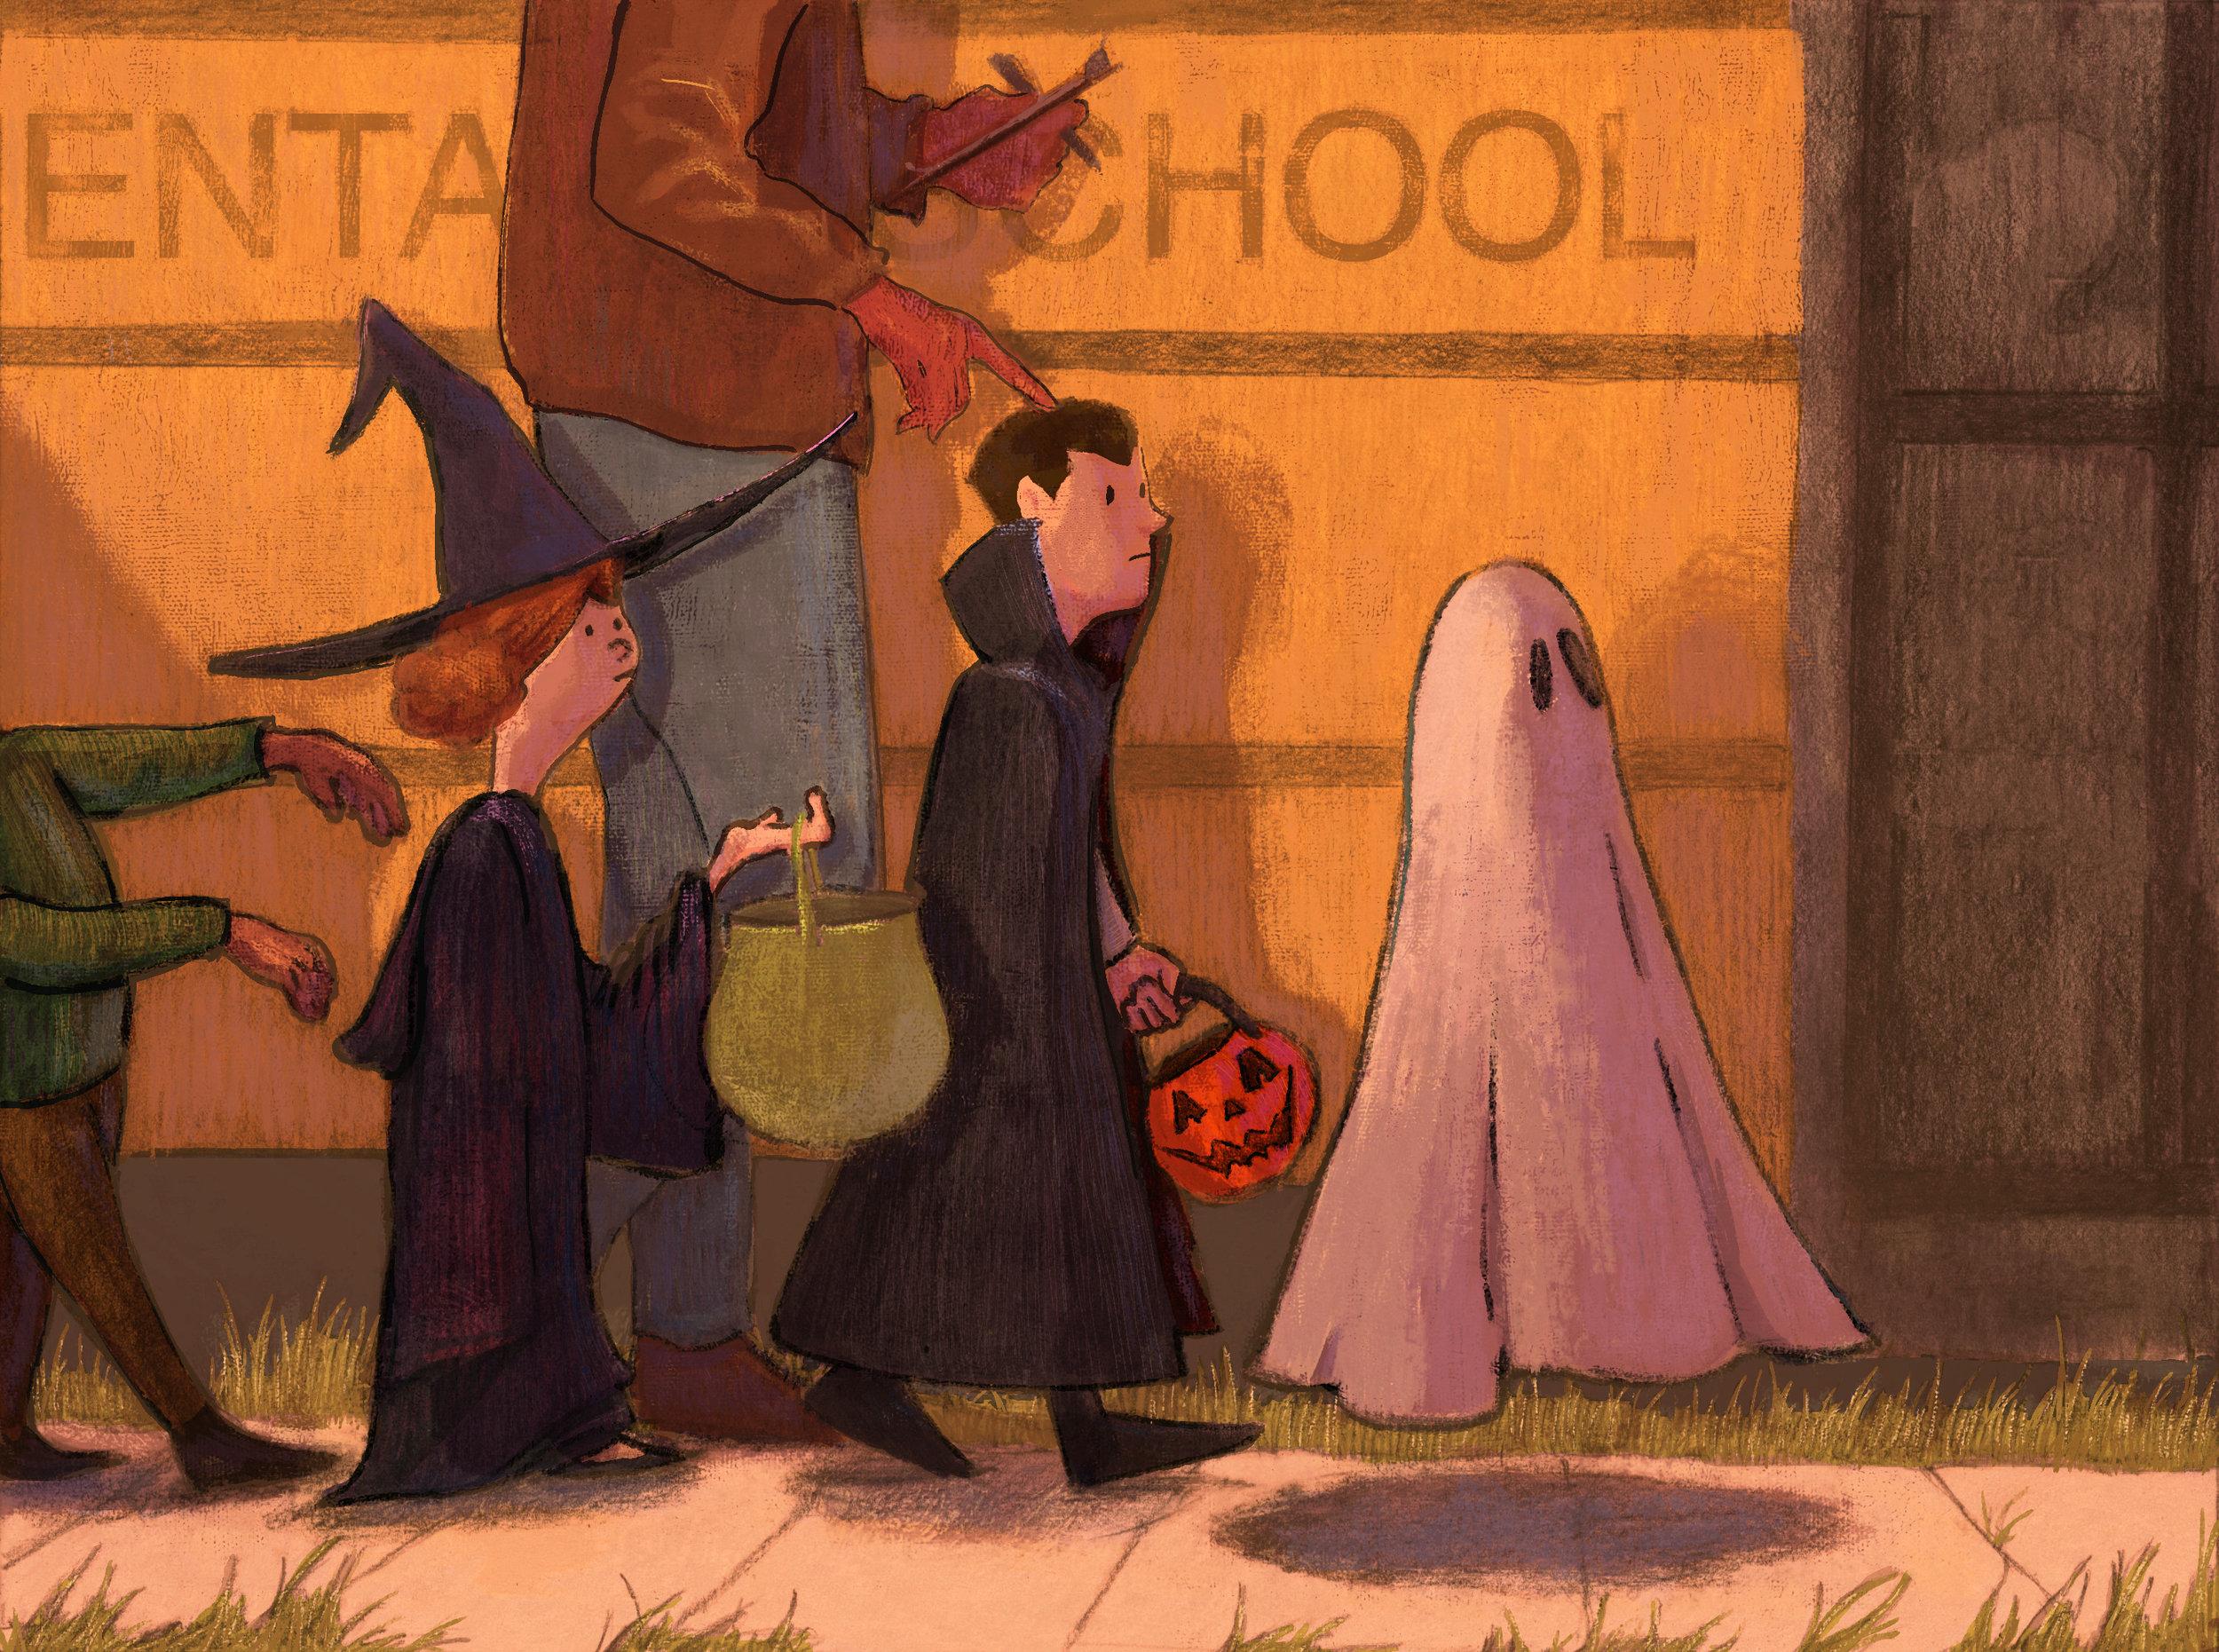 halloweenillustrationC2.jpg